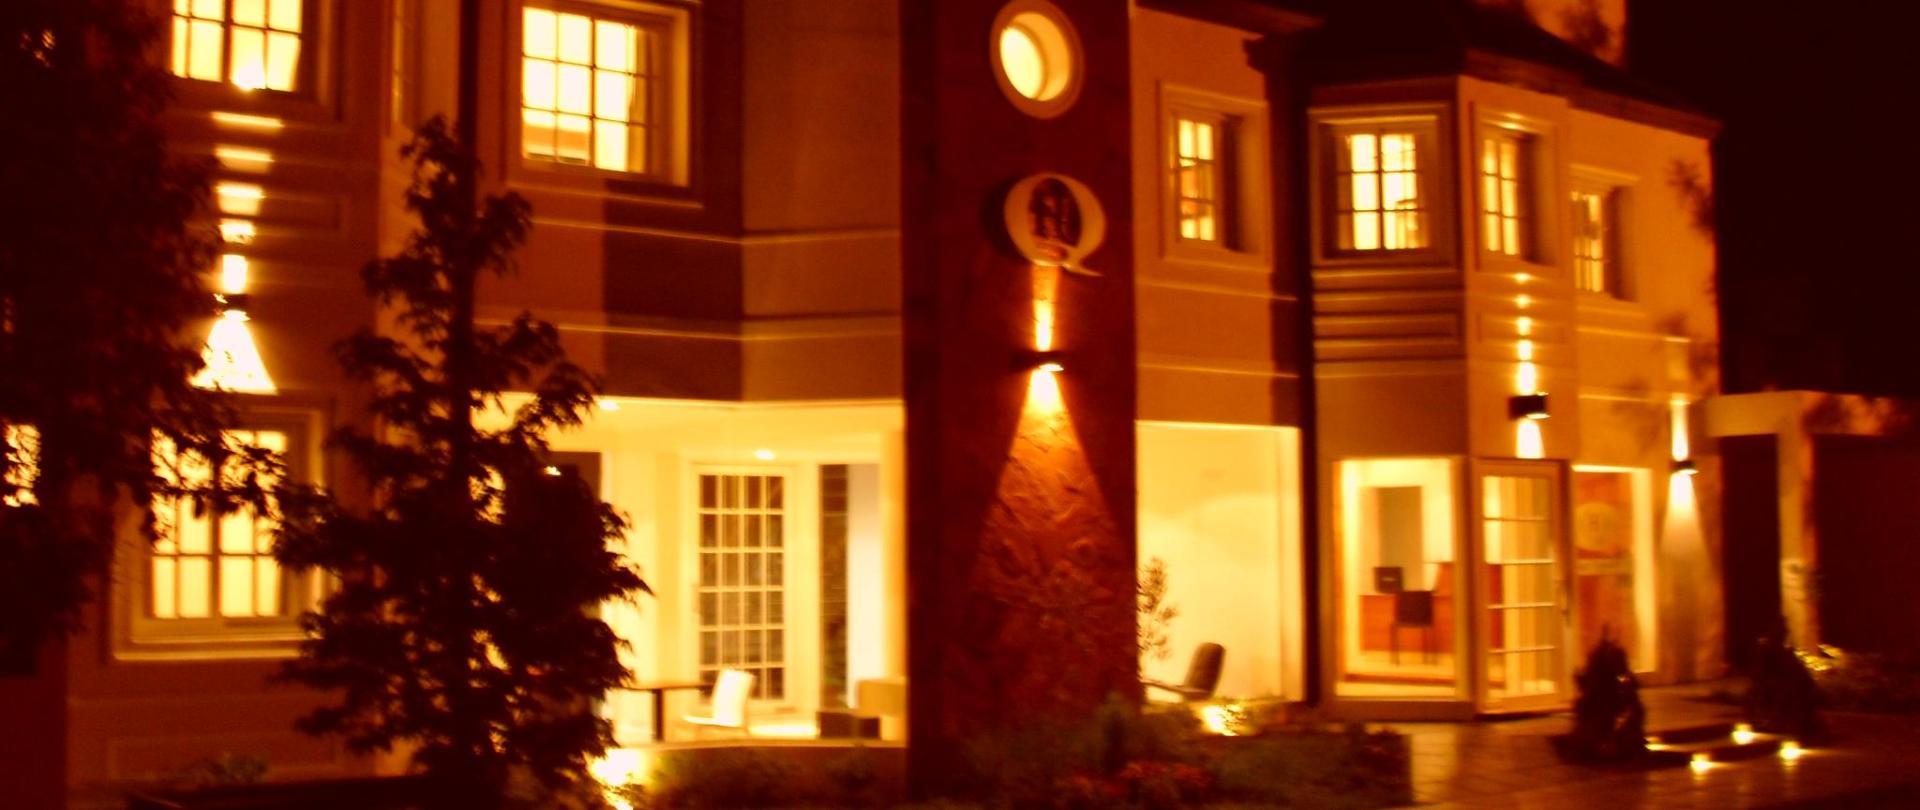 Hotel Queguay frente noche.jpg